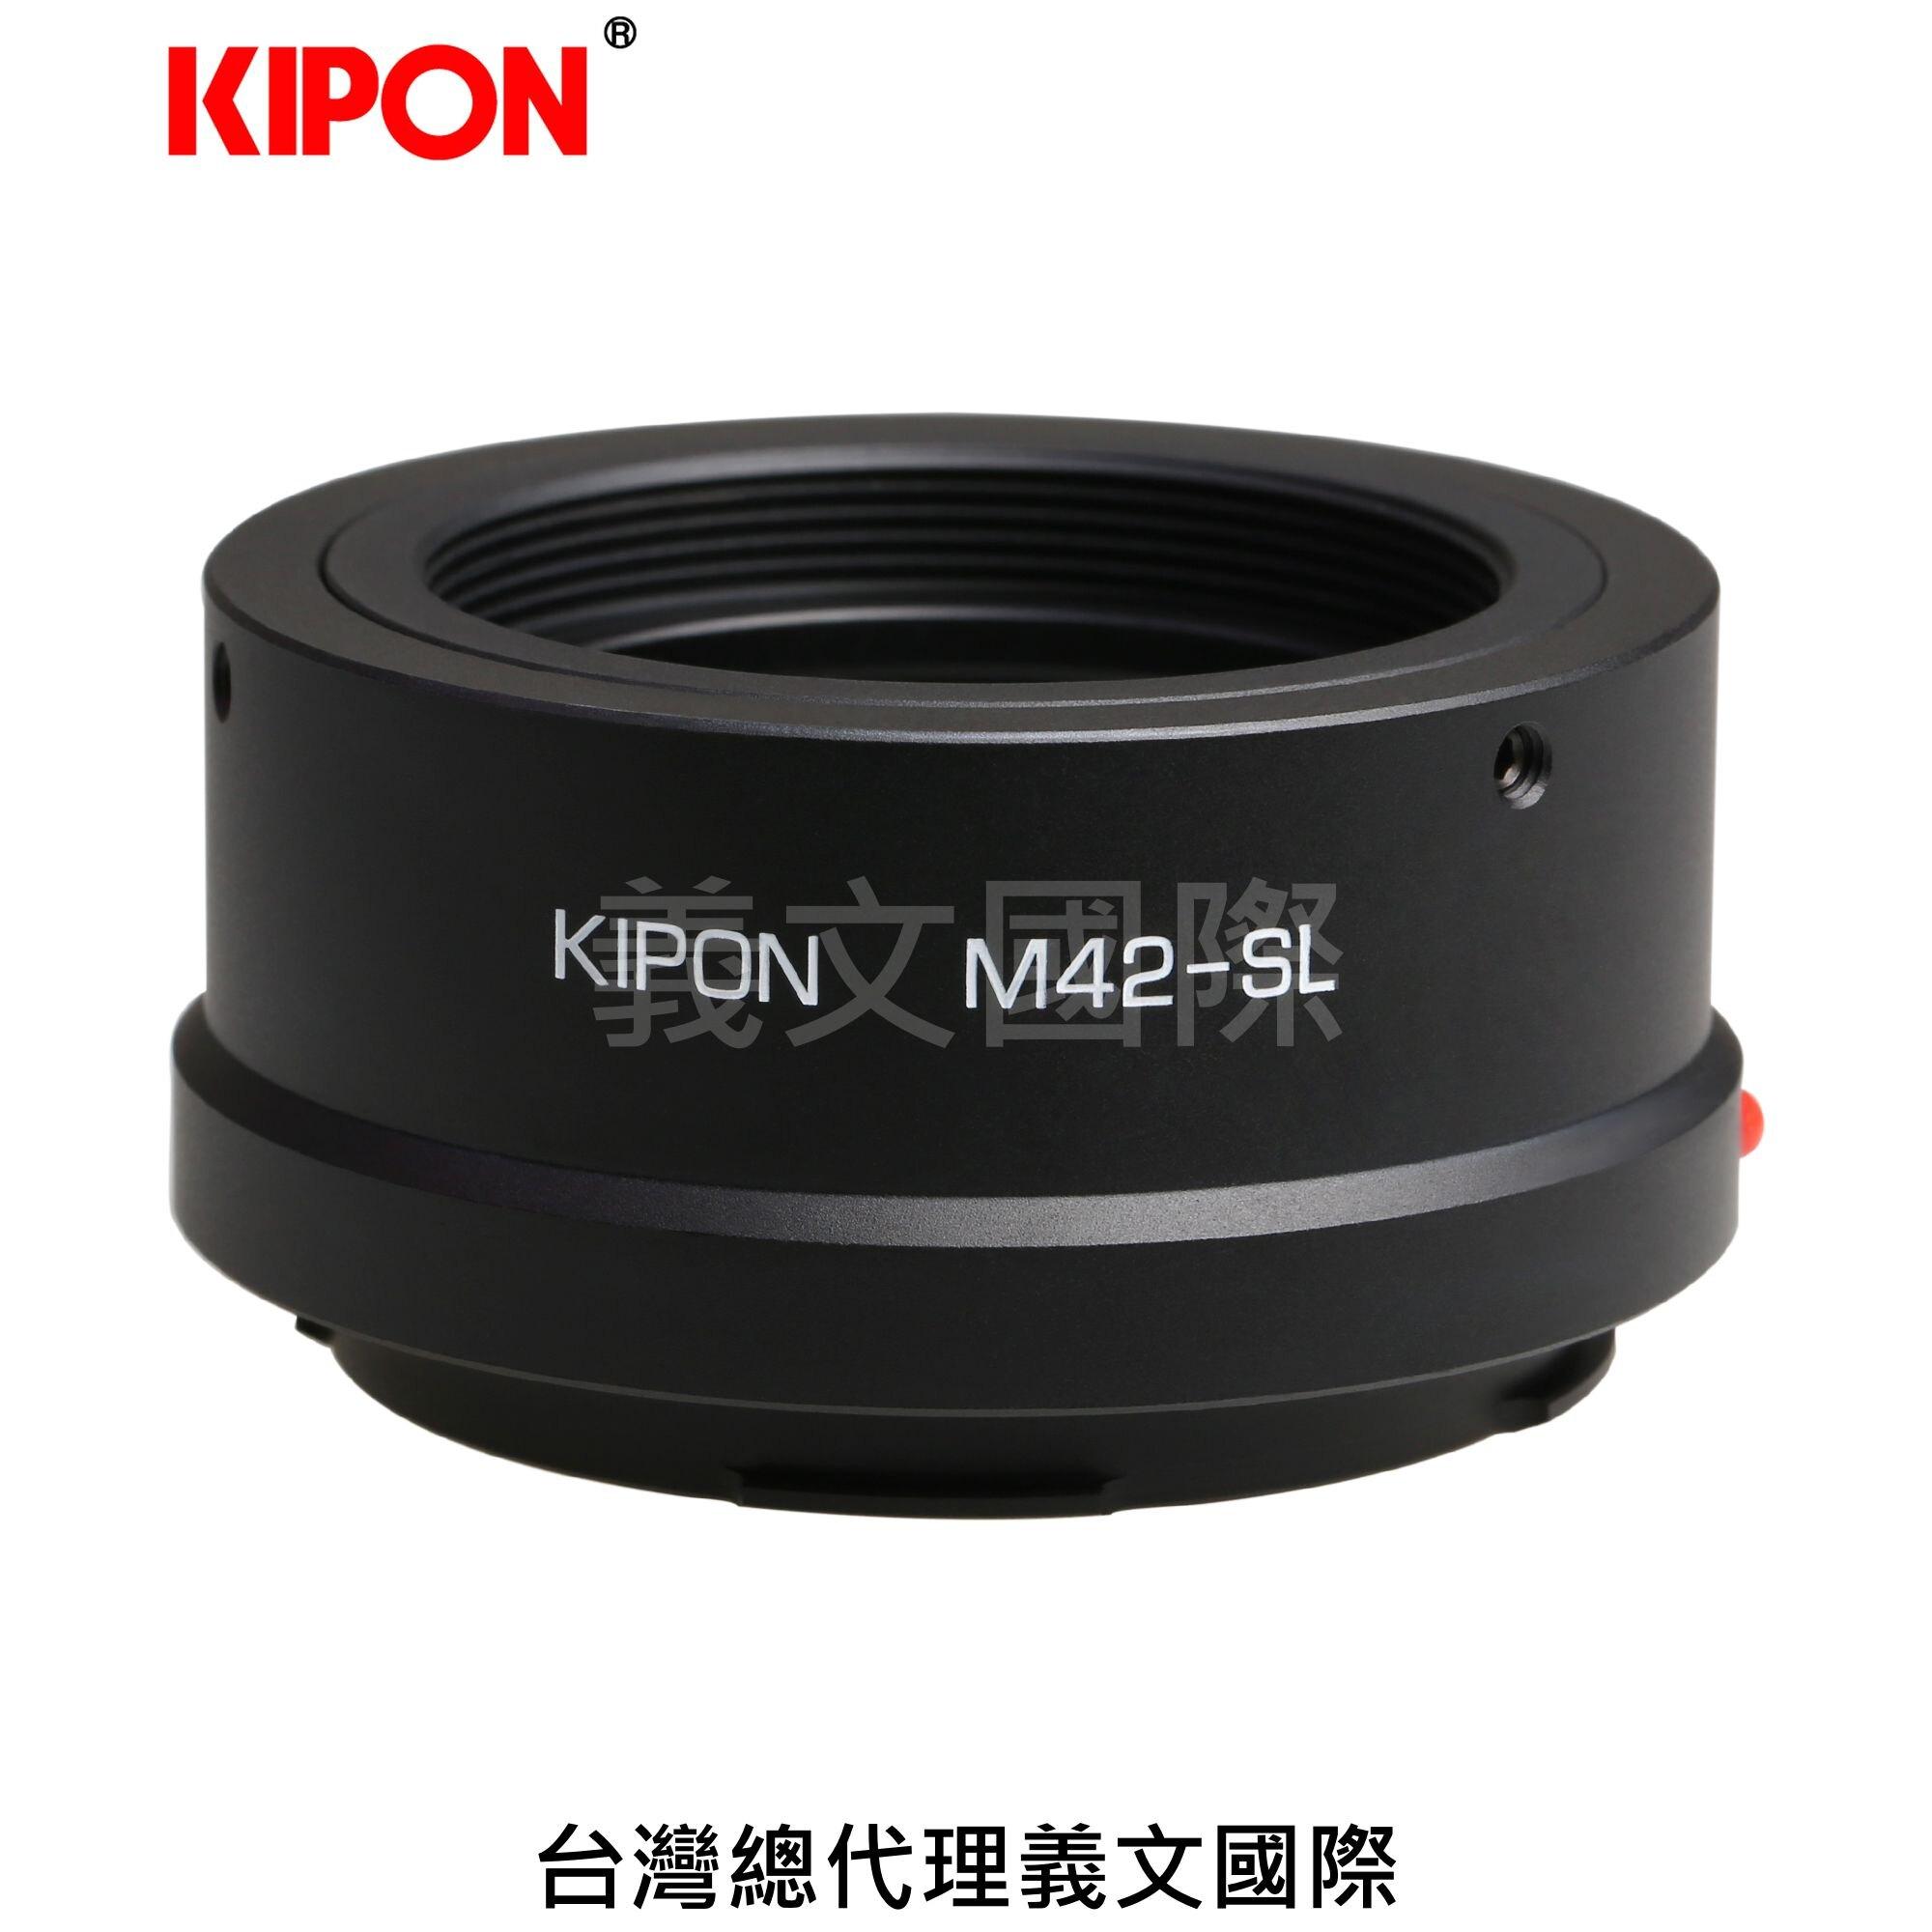 Kipon轉接環專賣店:M42-L(Leica SL,徠卡,M4/2,S1,S1R,S1H,TL,TL2,SIGMA FP)